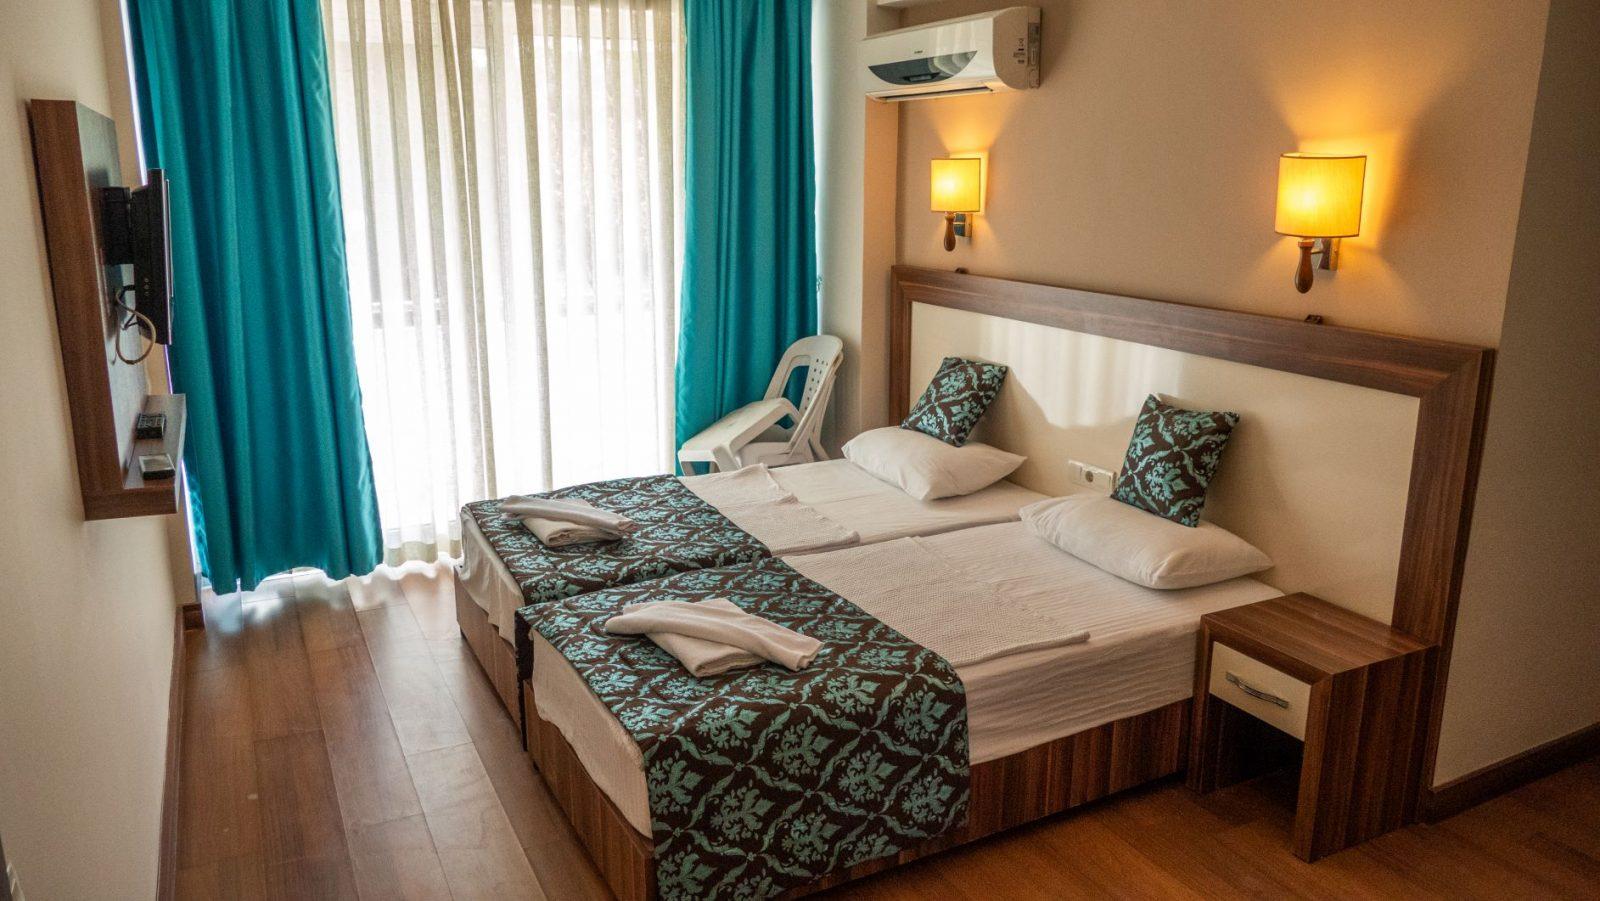 Letovanje Turska autobusom, Kusadasi, Hotel Santur,soba